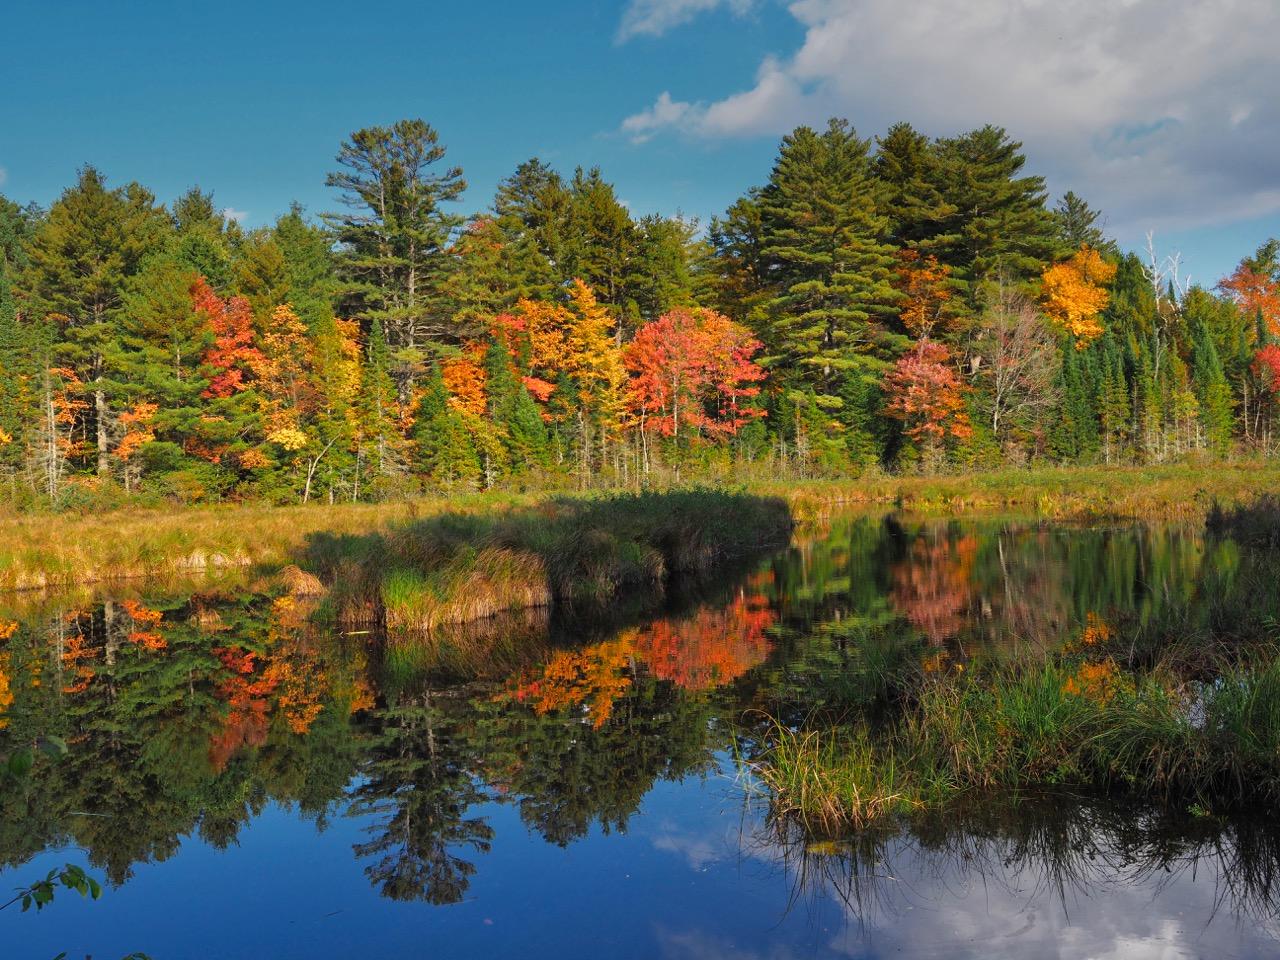 P39-closer reflection-pond-PA100559.jpg